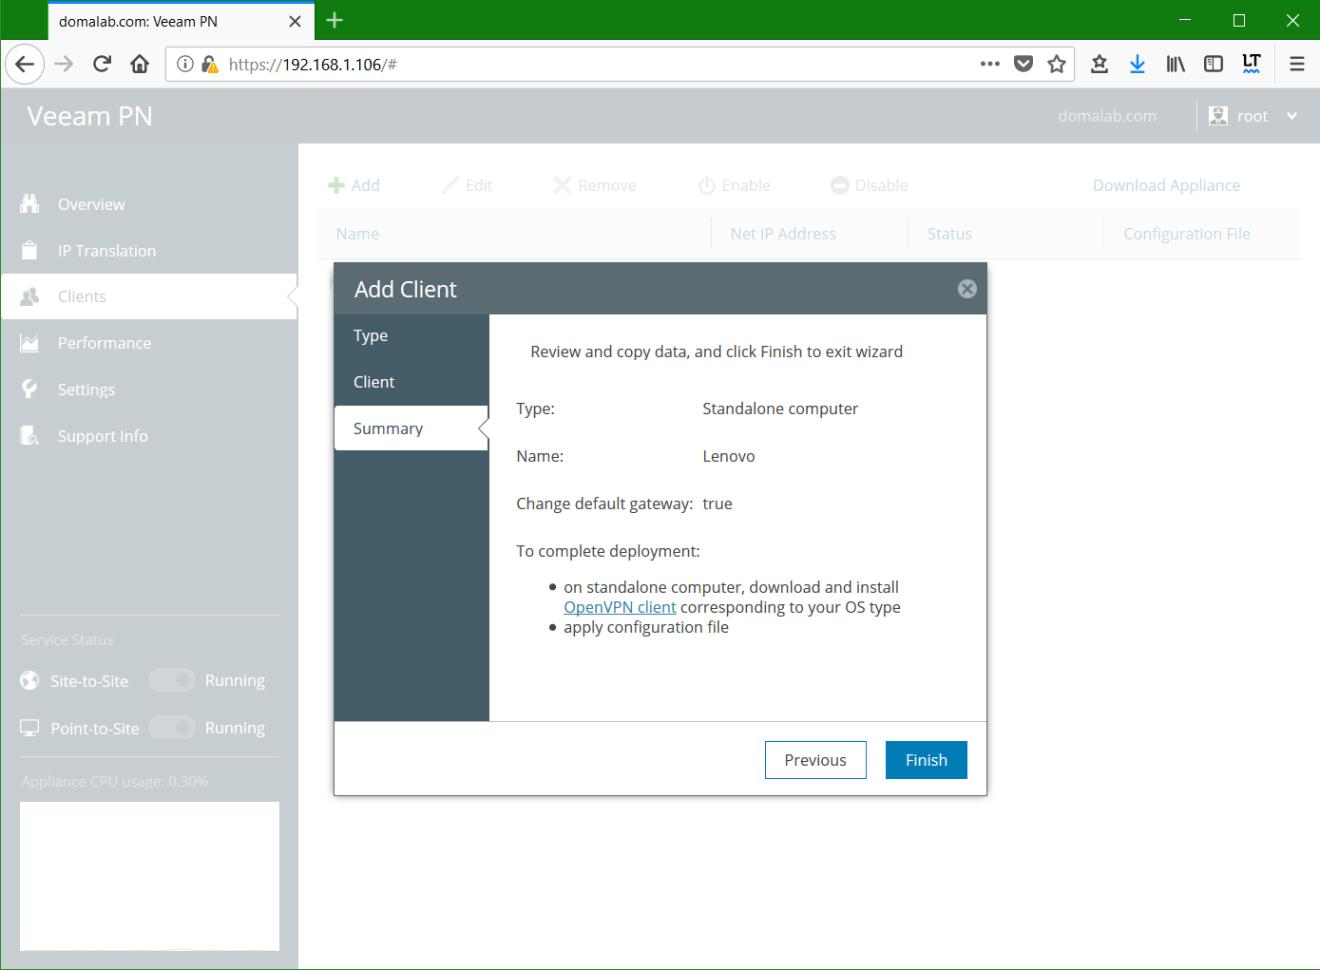 domalab.com Veeam PN Client summary